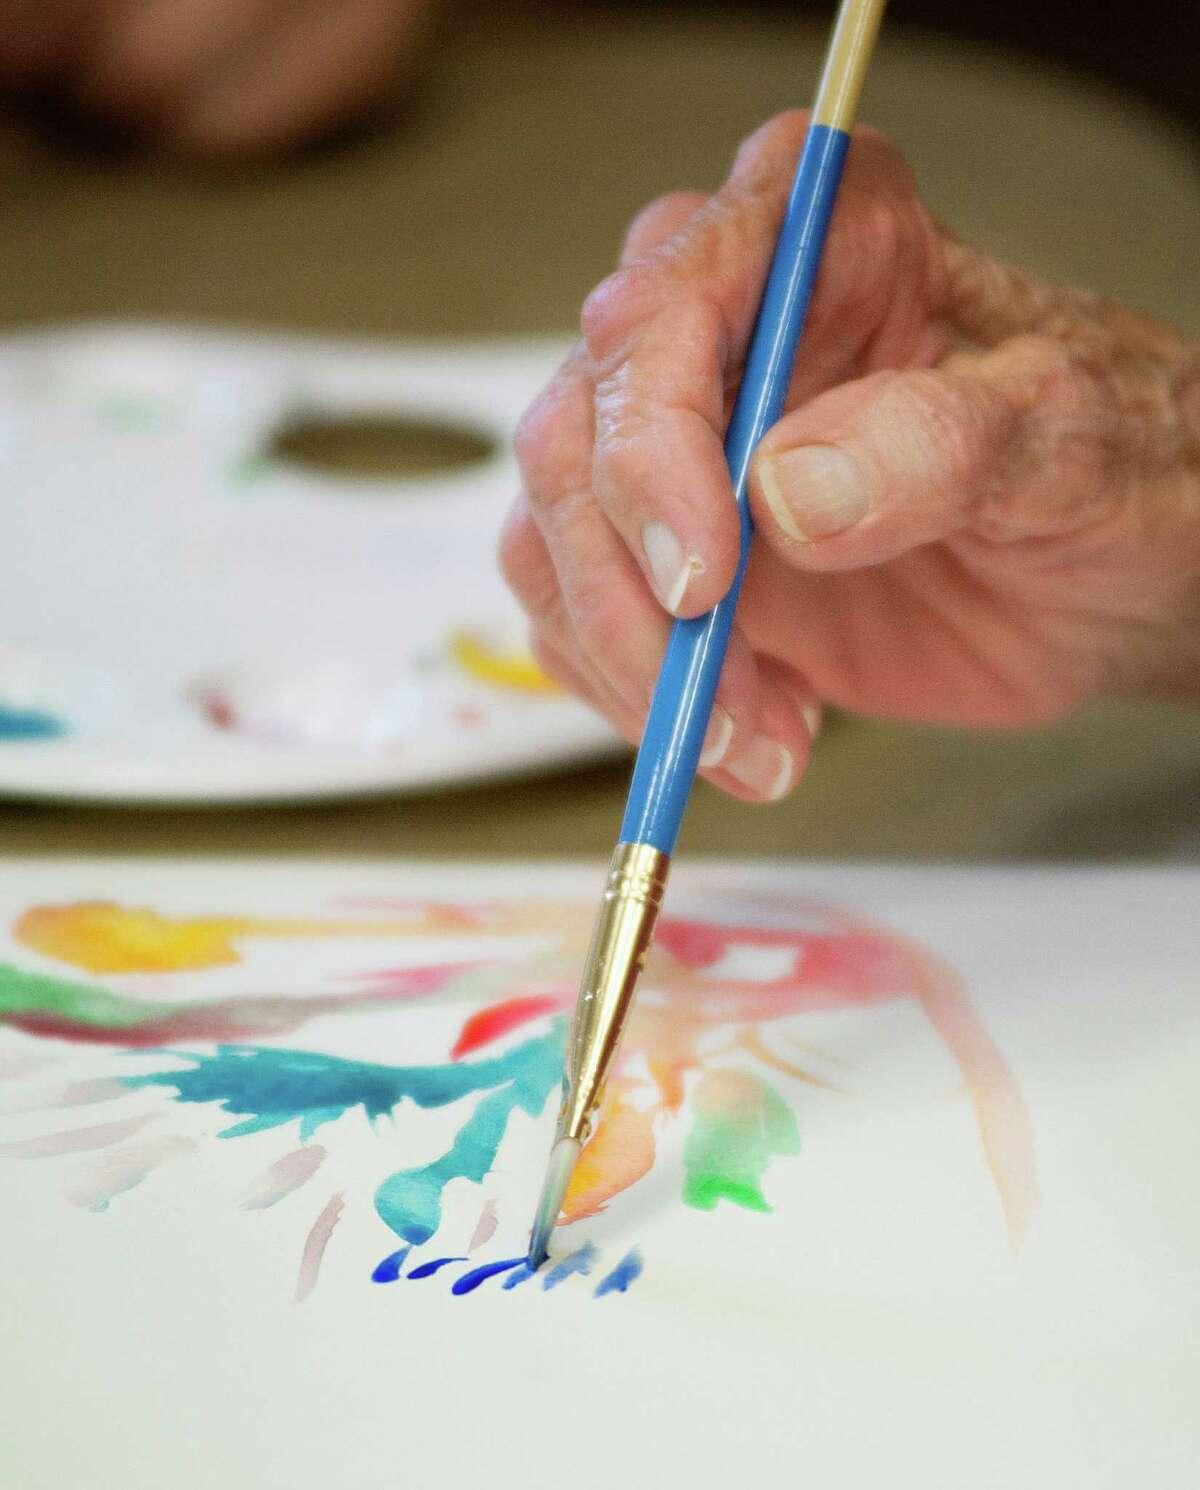 Memory art class participant Nettie Cook paints with watercolors, Monday, June 4, 2012, at Franklin Park in San Antonio.